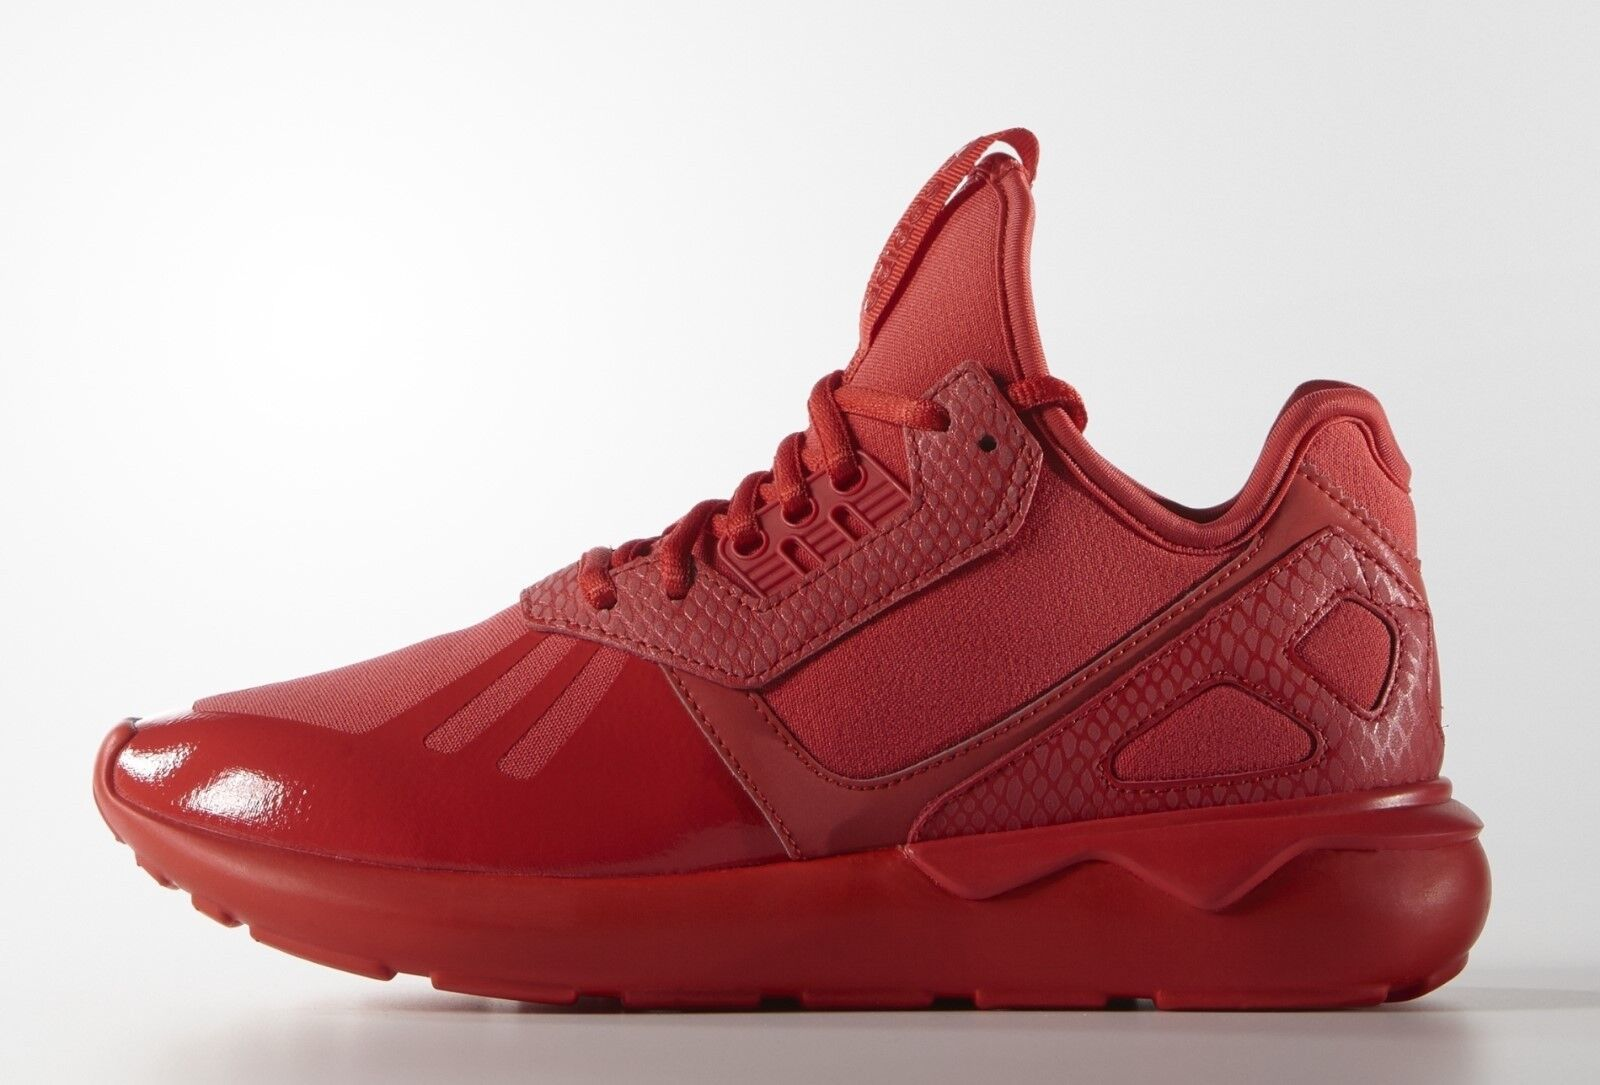 adidas Turnschuhe TUBULAR RUNNER W S78935 red rot NEU rot Sportschuhe PK Spezial